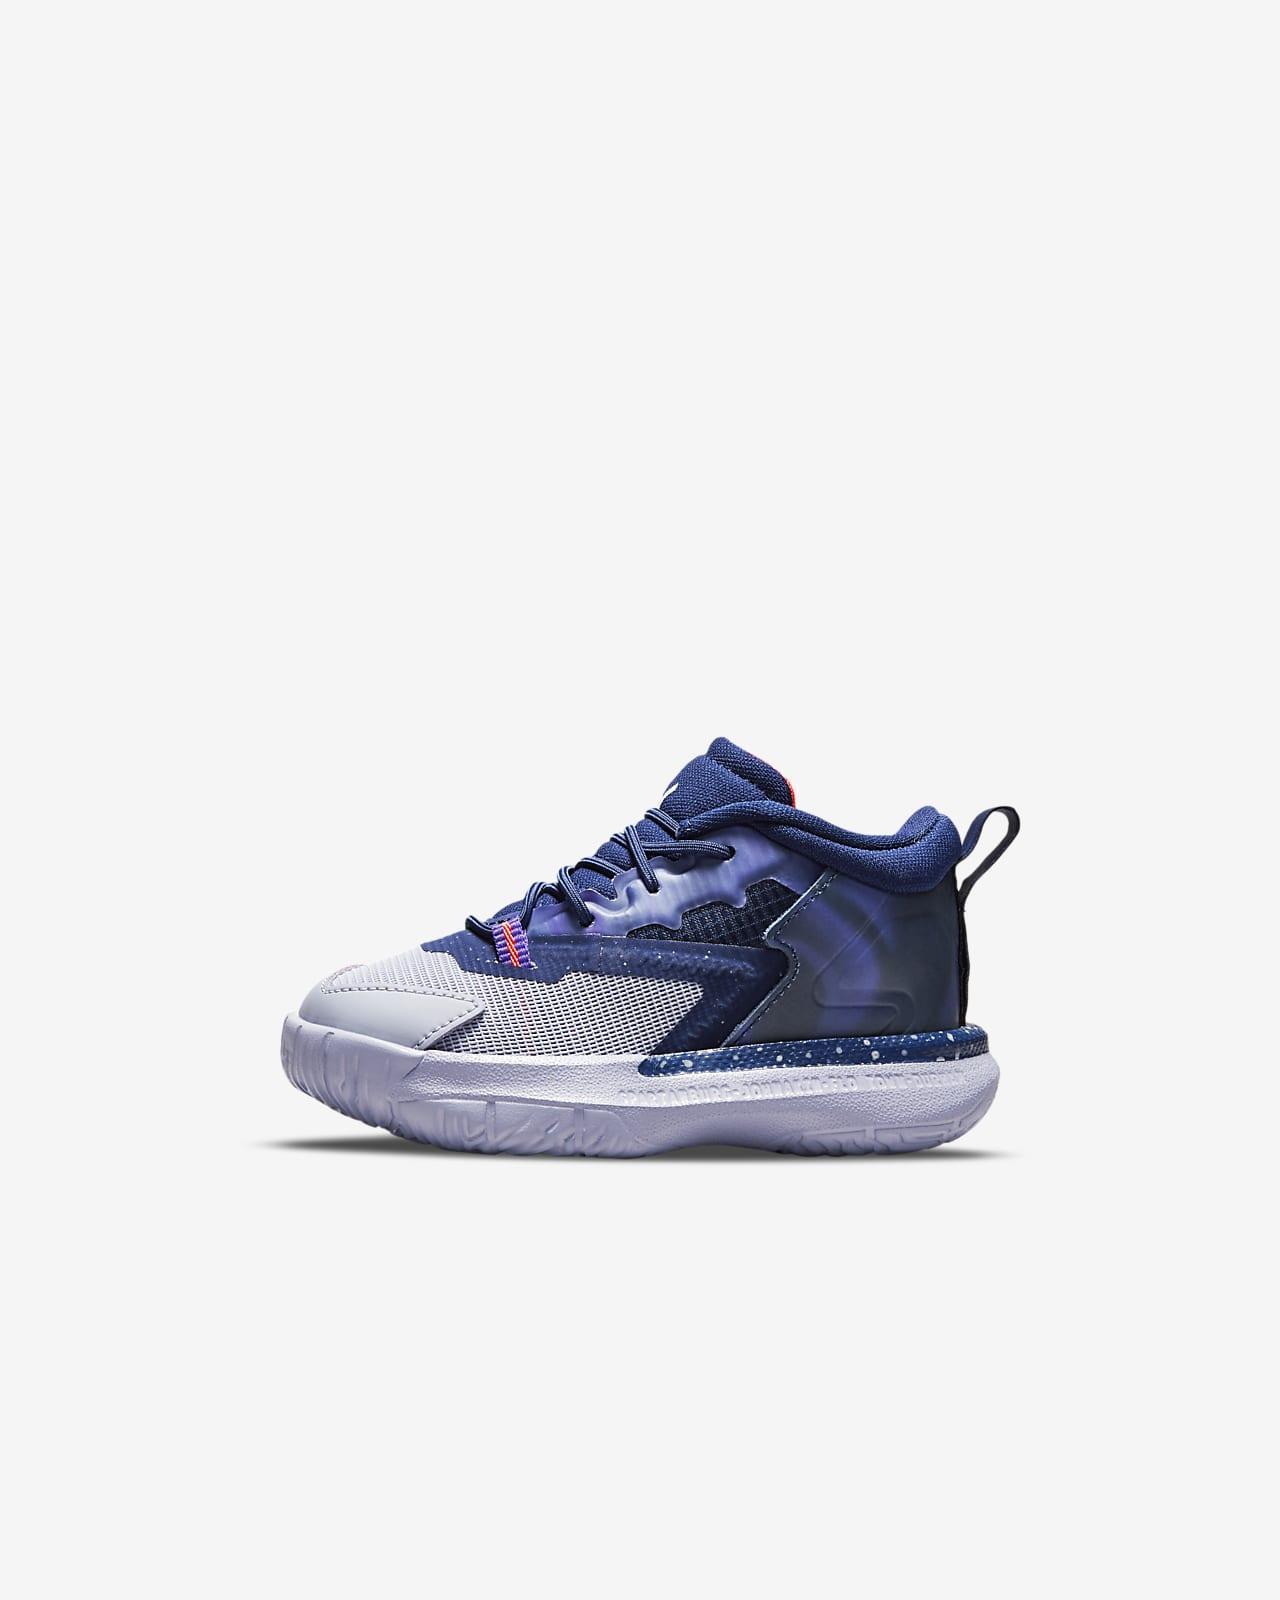 Zion 1 Infant/Toddler Shoe